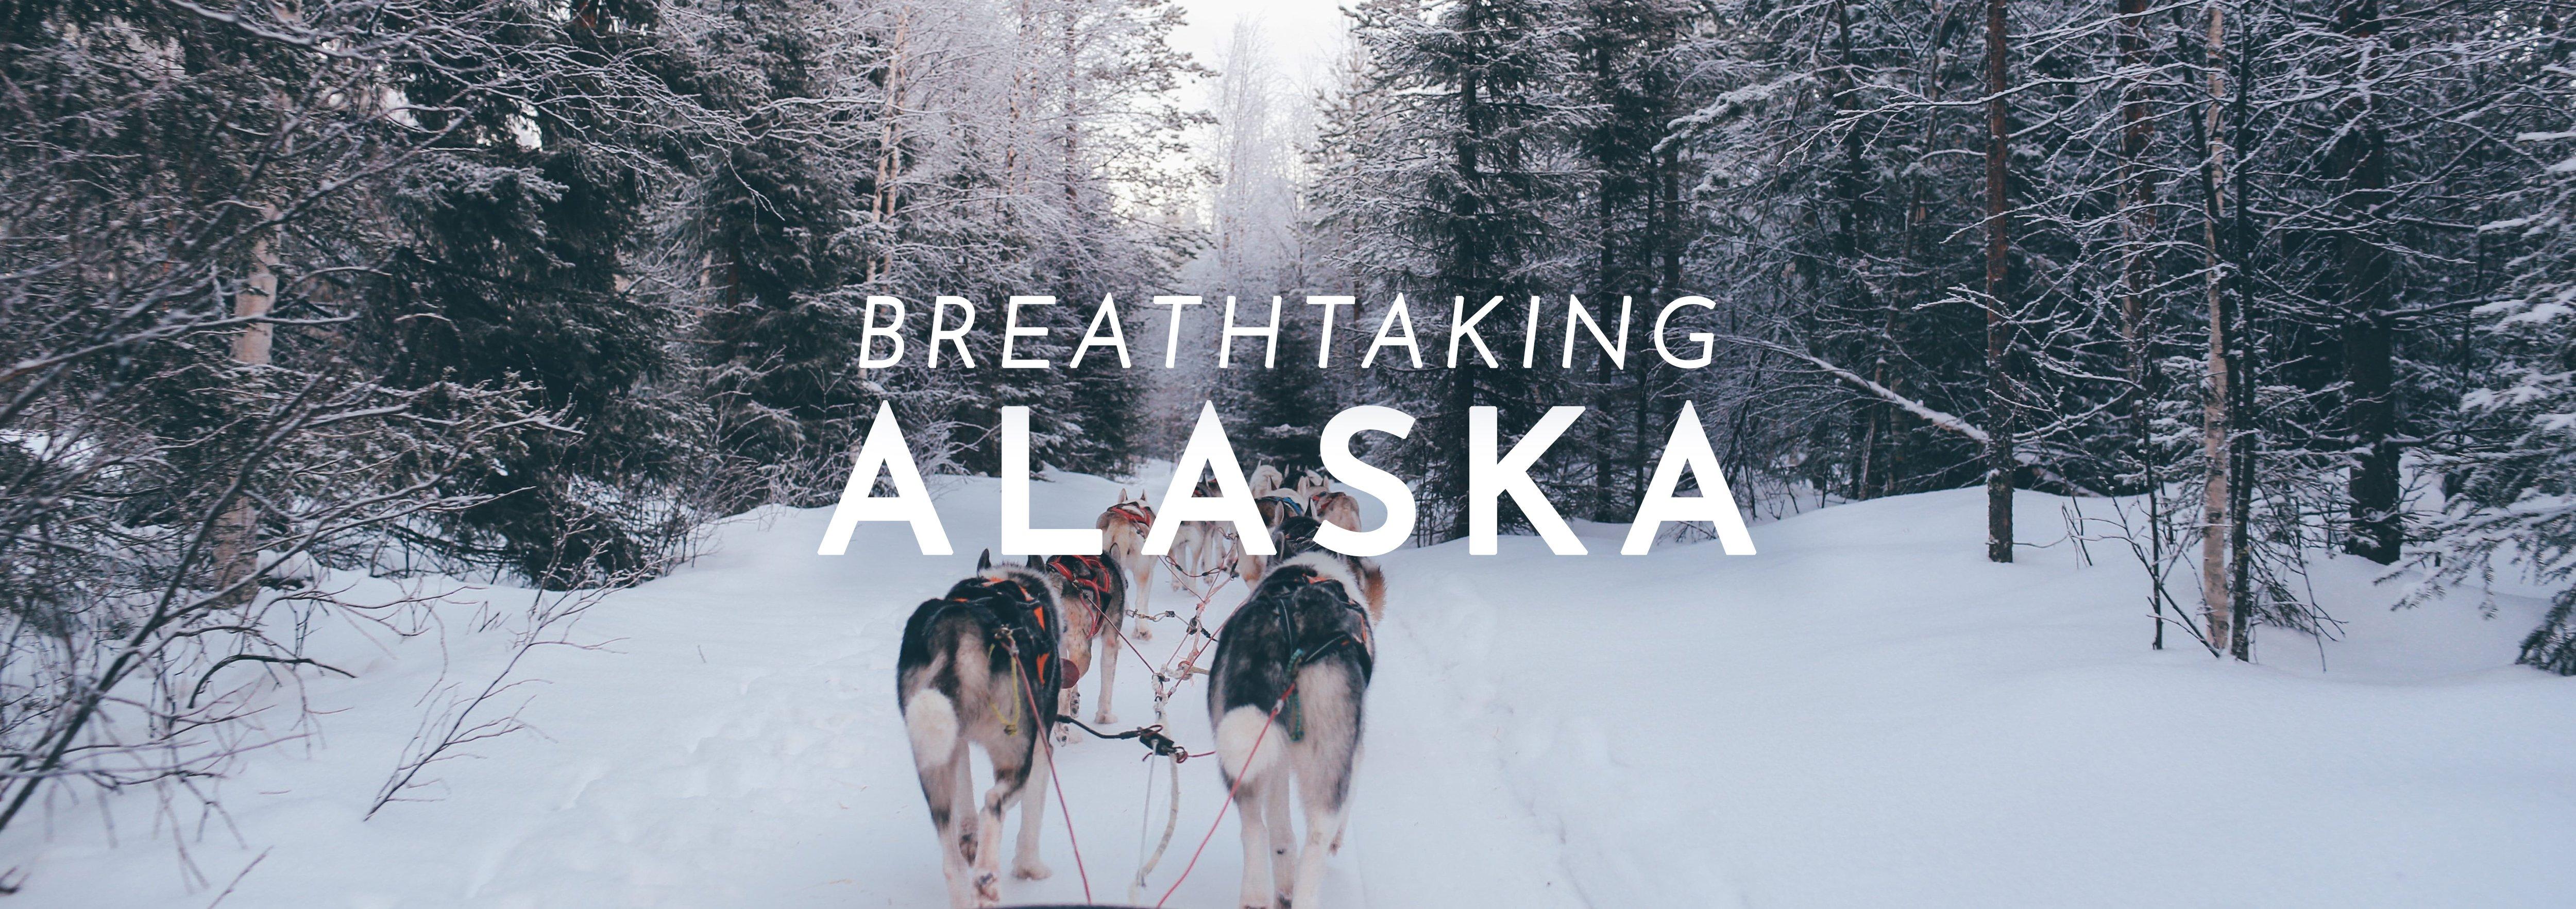 AlaskaHeader2